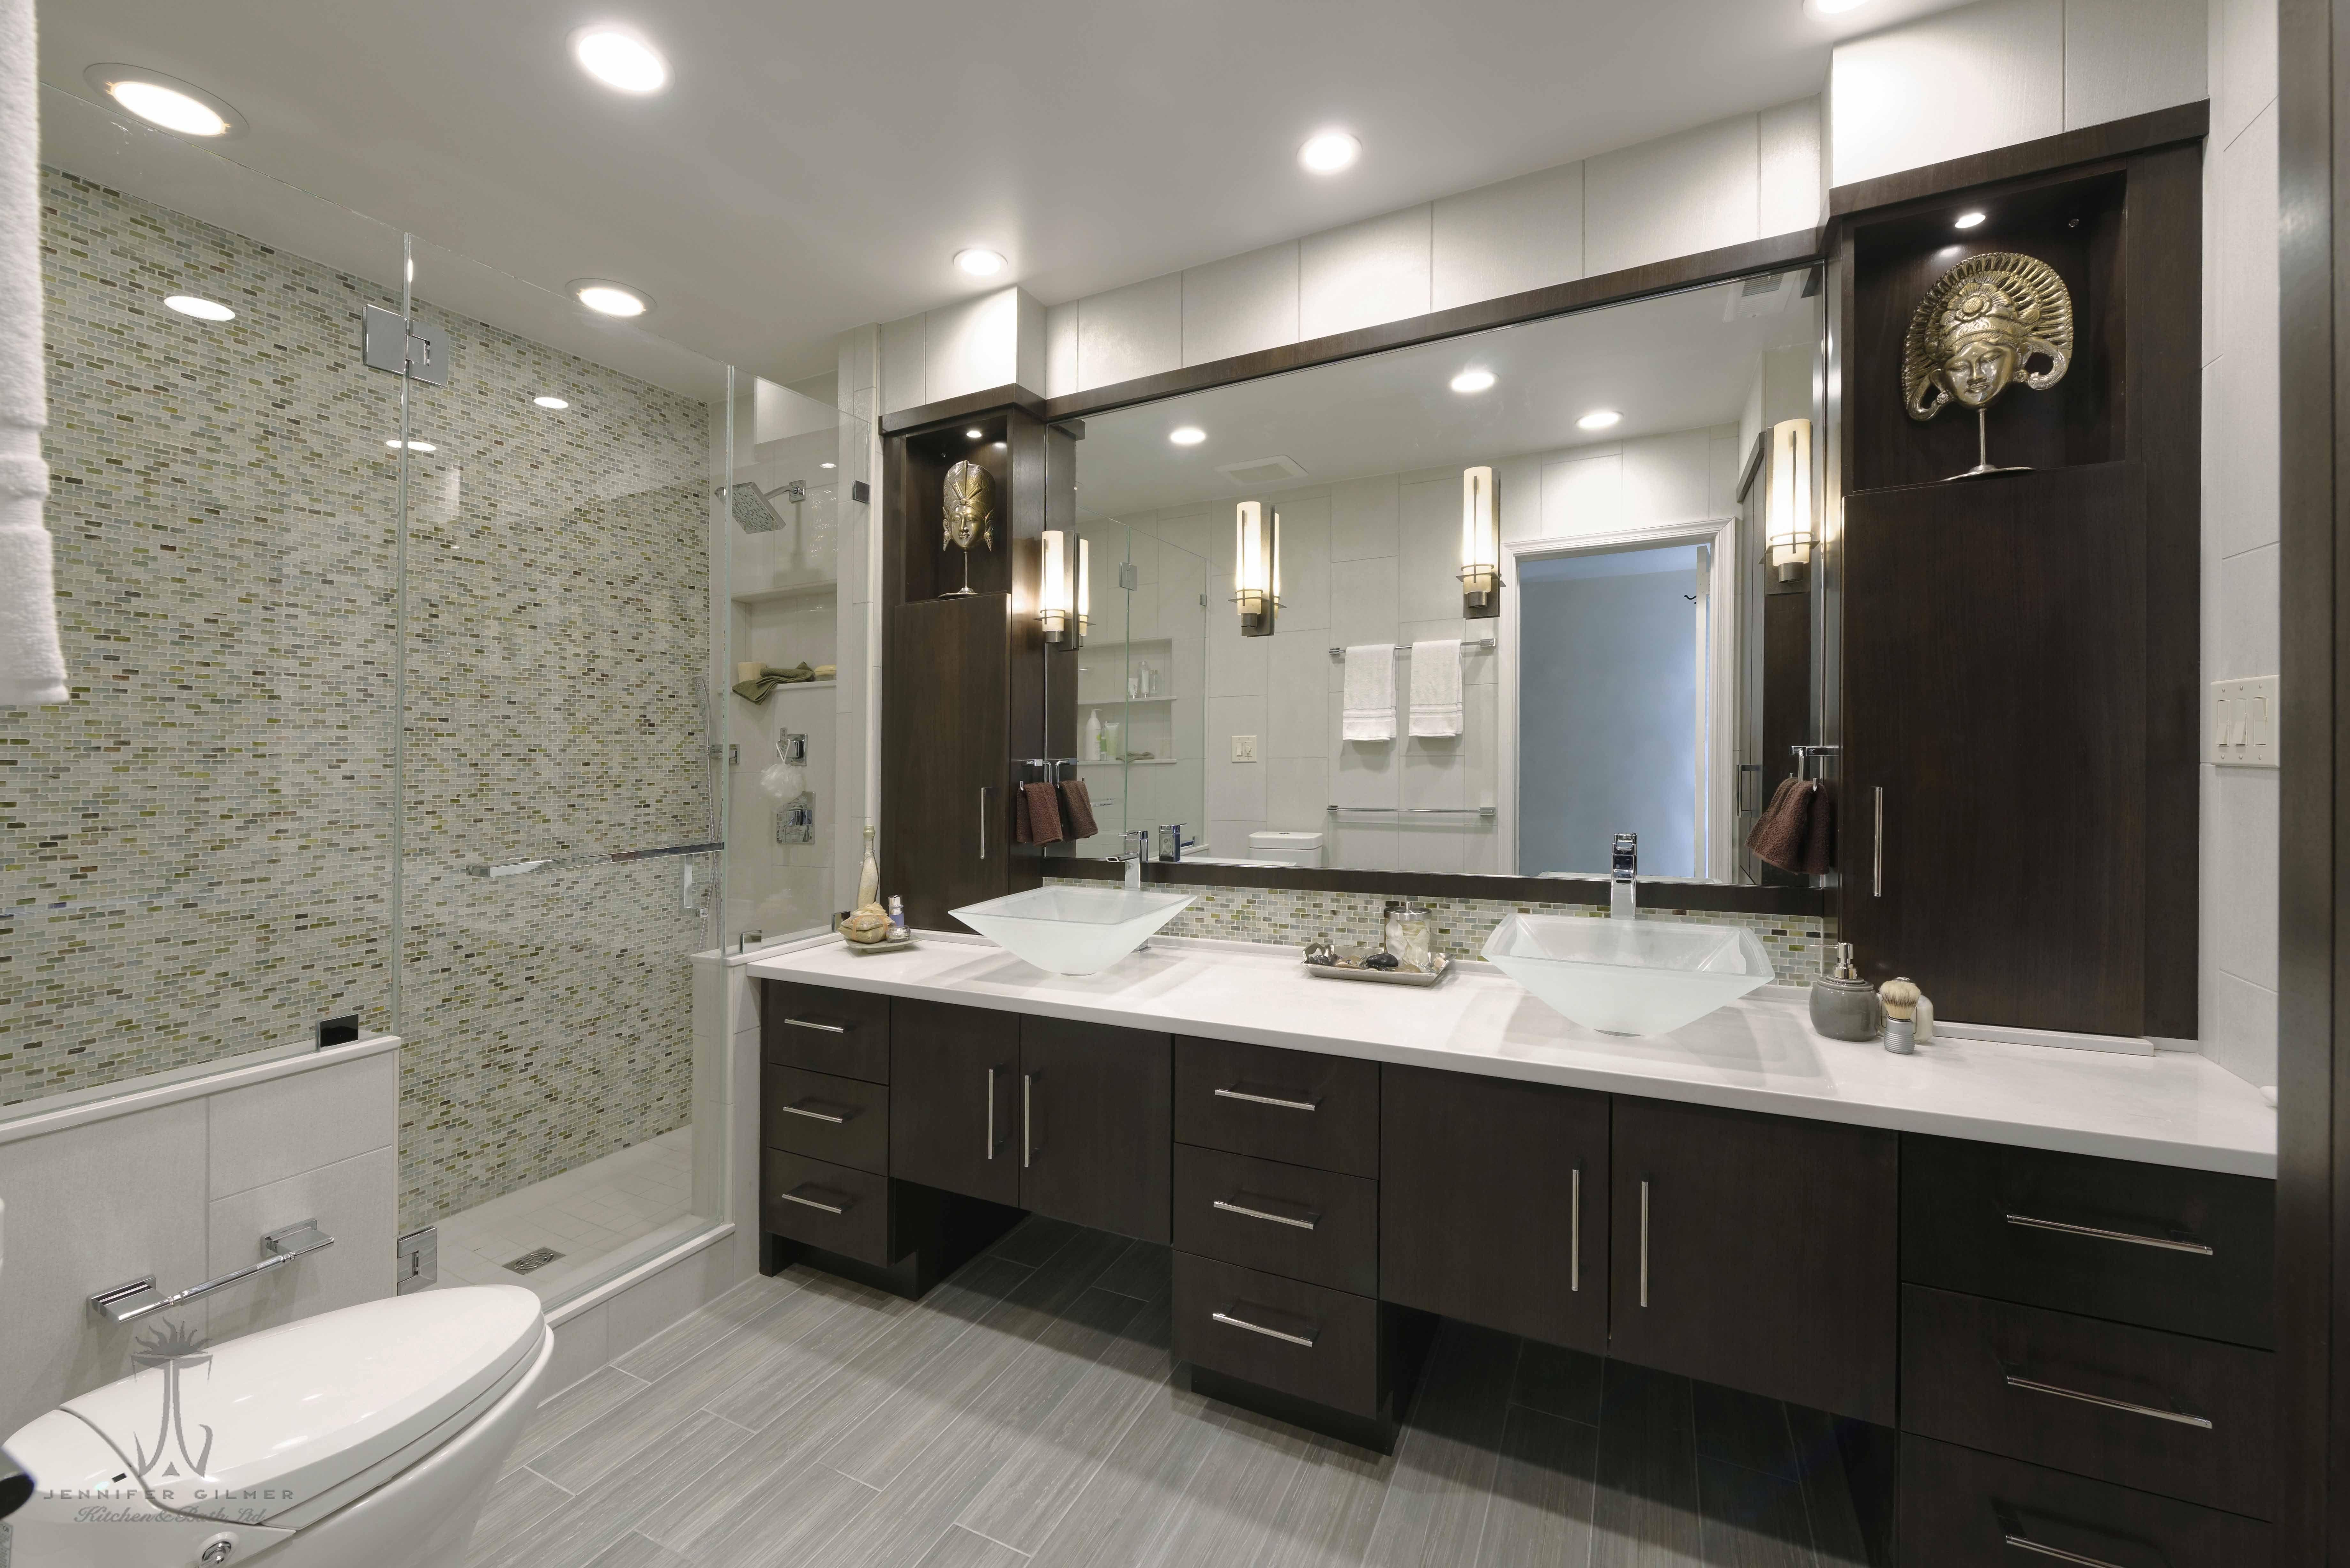 Master Bath In Washington Dc Designed By Jennifer Gilmerkitchen Bath Includes A Caesarstone Mis Bathroom Design Concepts Kitchen Bathroom Remodel Bath Design [ 4912 x 7360 Pixel ]